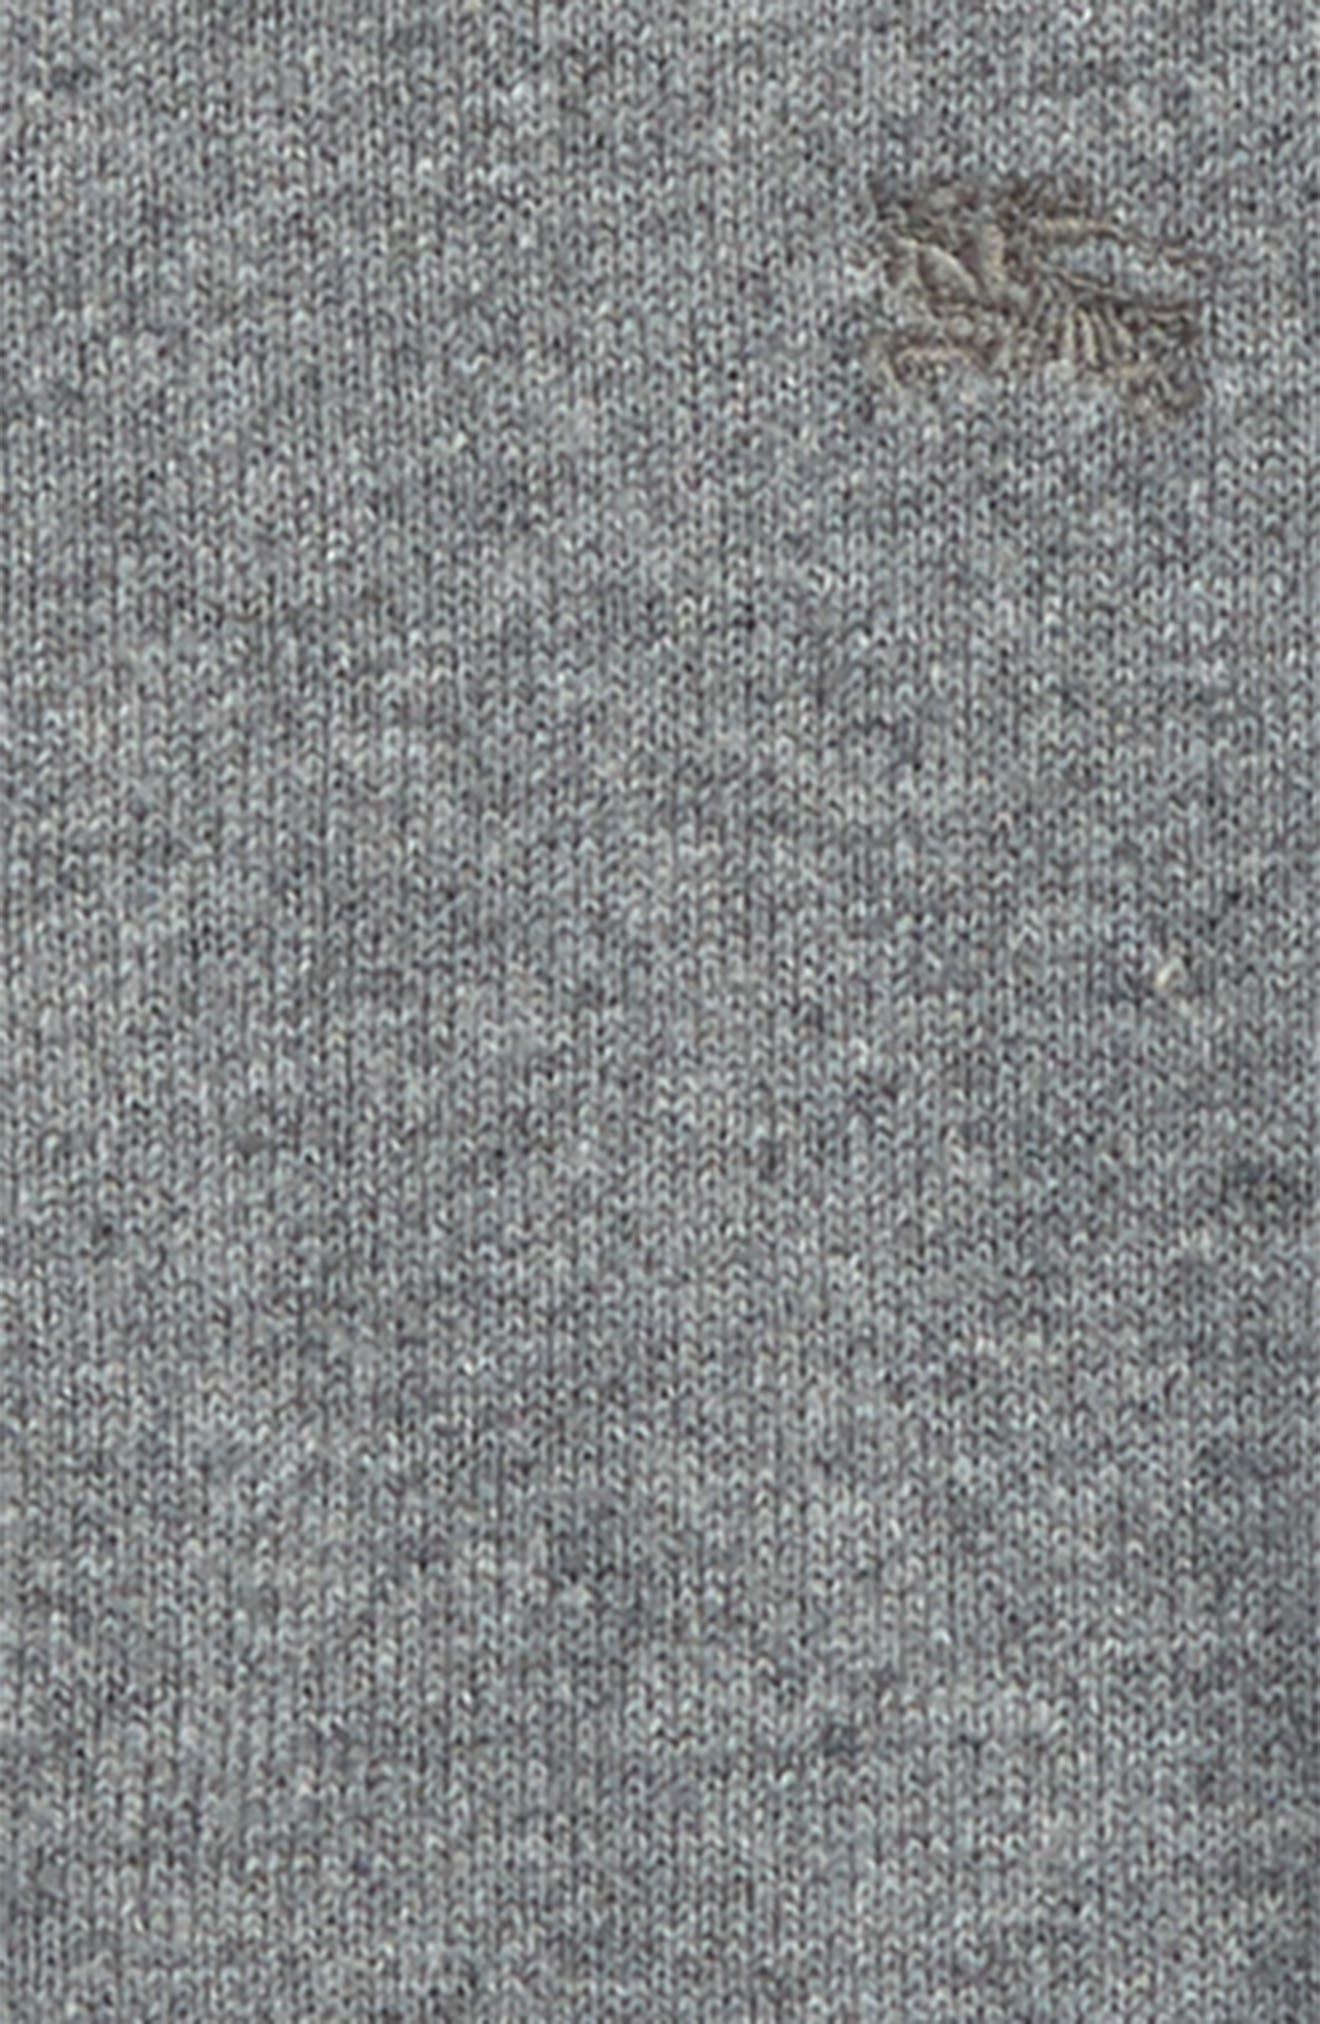 Alternate Image 2  - Burberry 'Mini Jaxson' Front Zip Cotton Cardigan (Baby & Toddler)